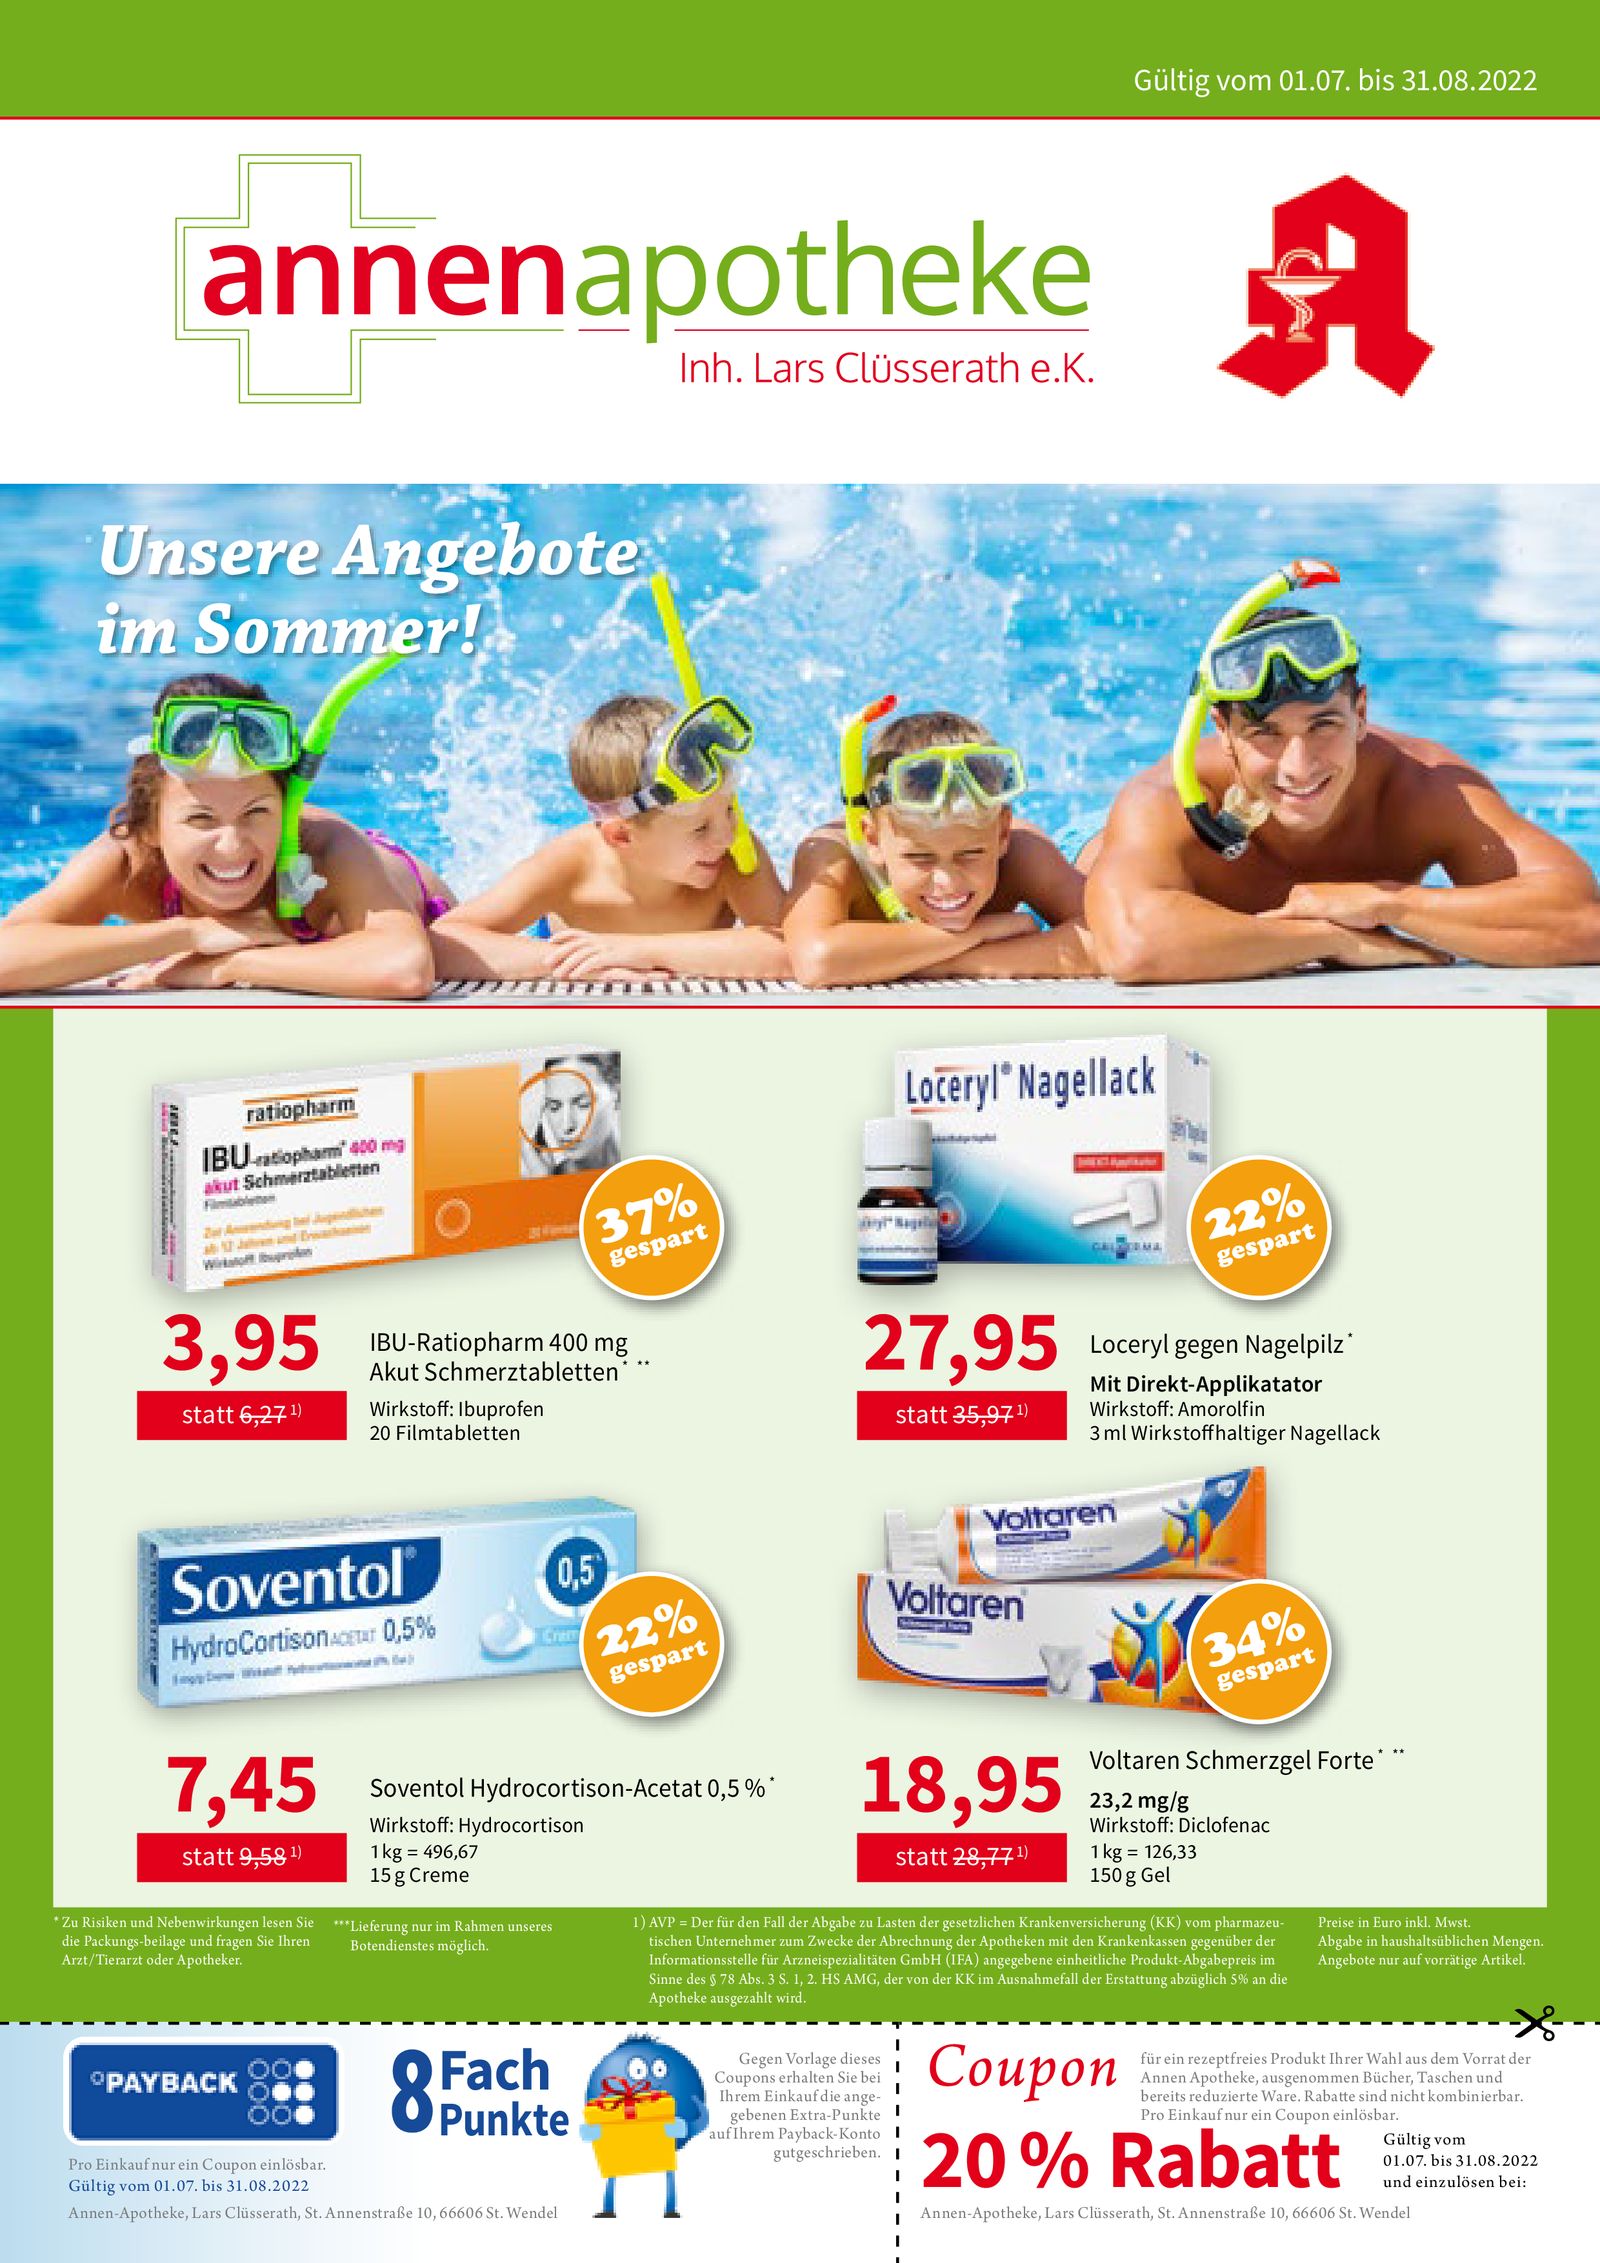 https://mein-uploads.apocdn.net/12597/leaflets/12597_flyer-Seite1.png